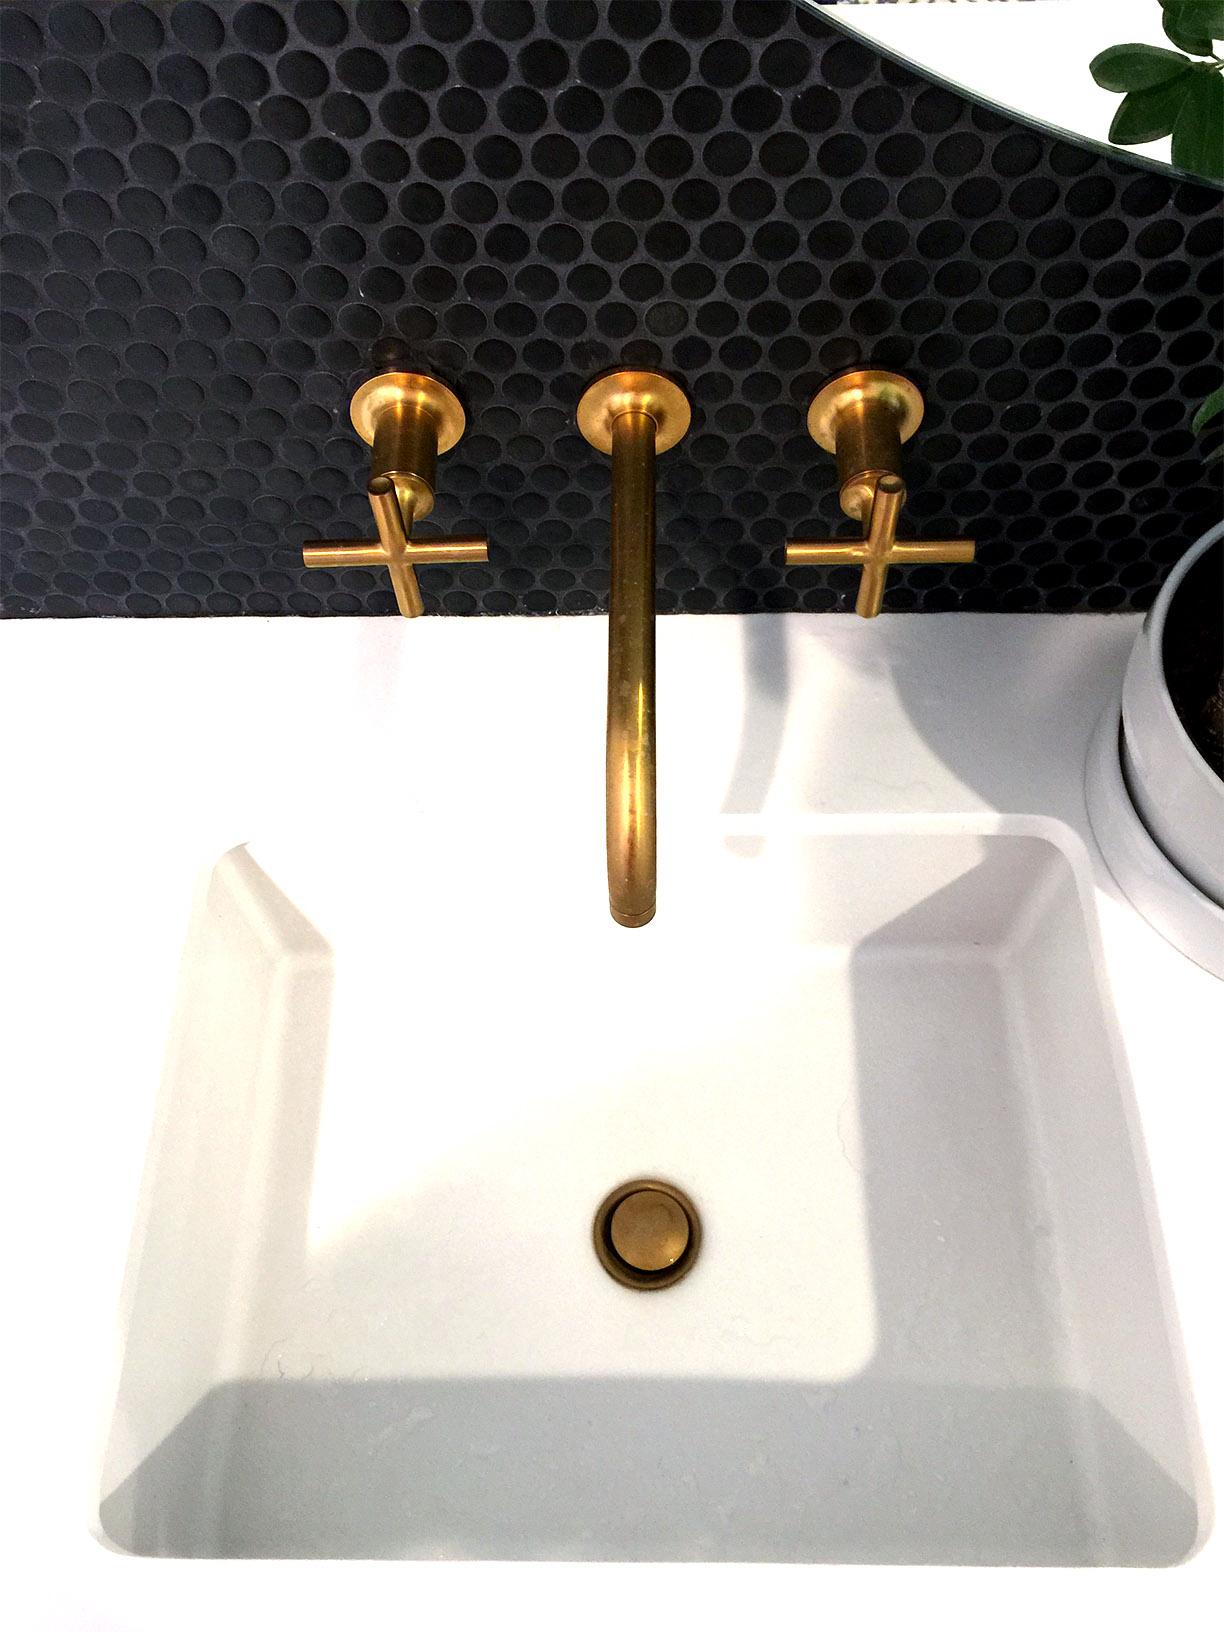 Behind The Sink Backsplash Glazed Matte Black Penny Round Mosaic Tiledaily